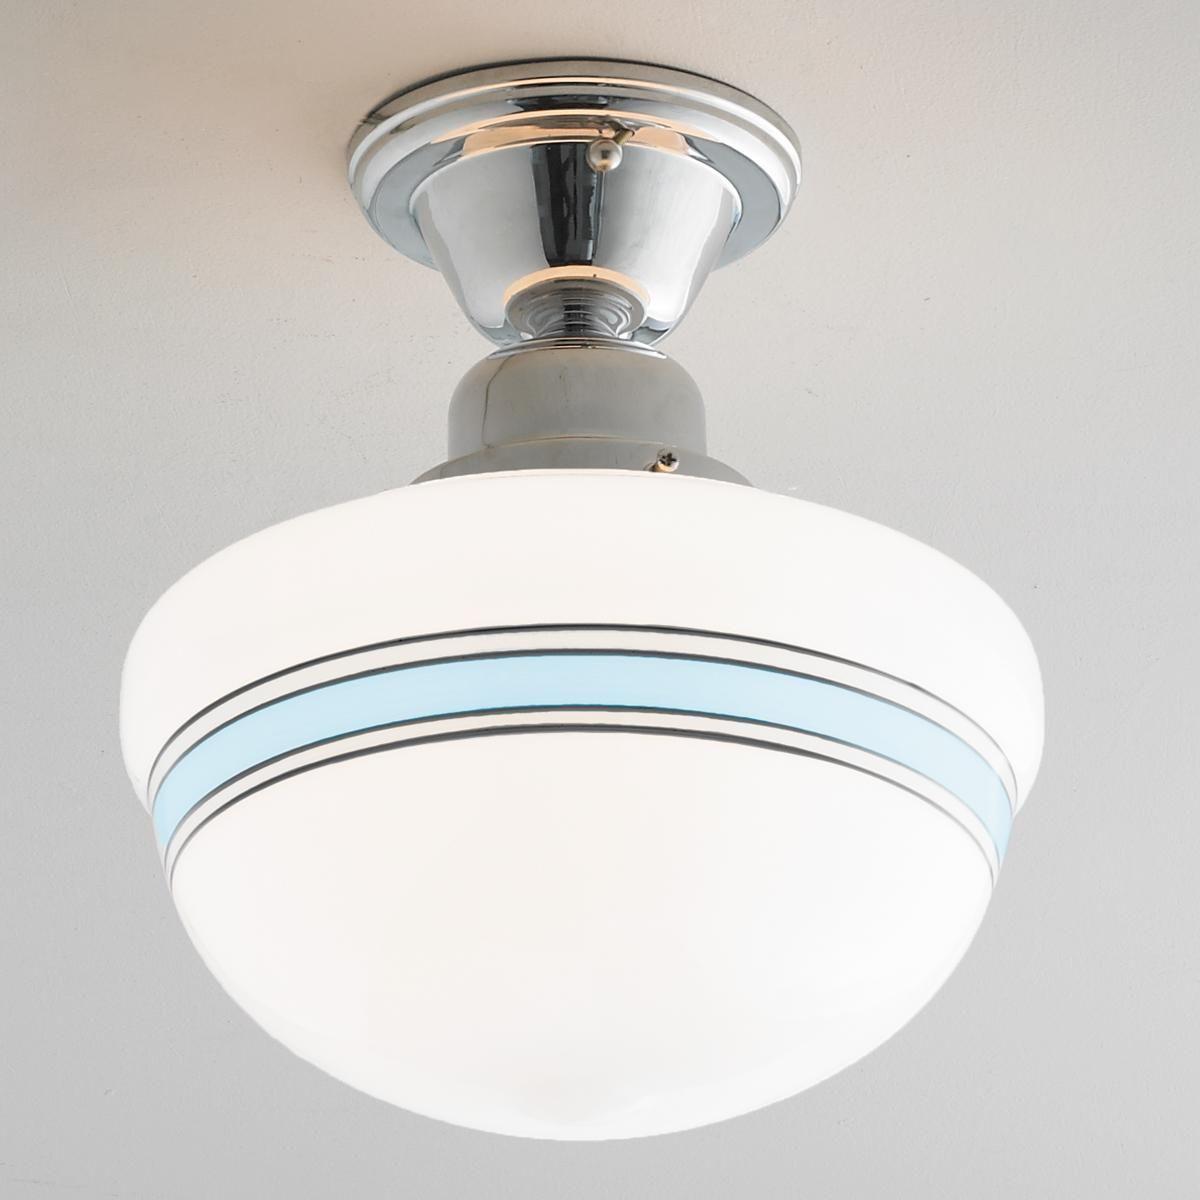 schoolhouse d deco fixture lights dl custom shade ceiling products pendant light